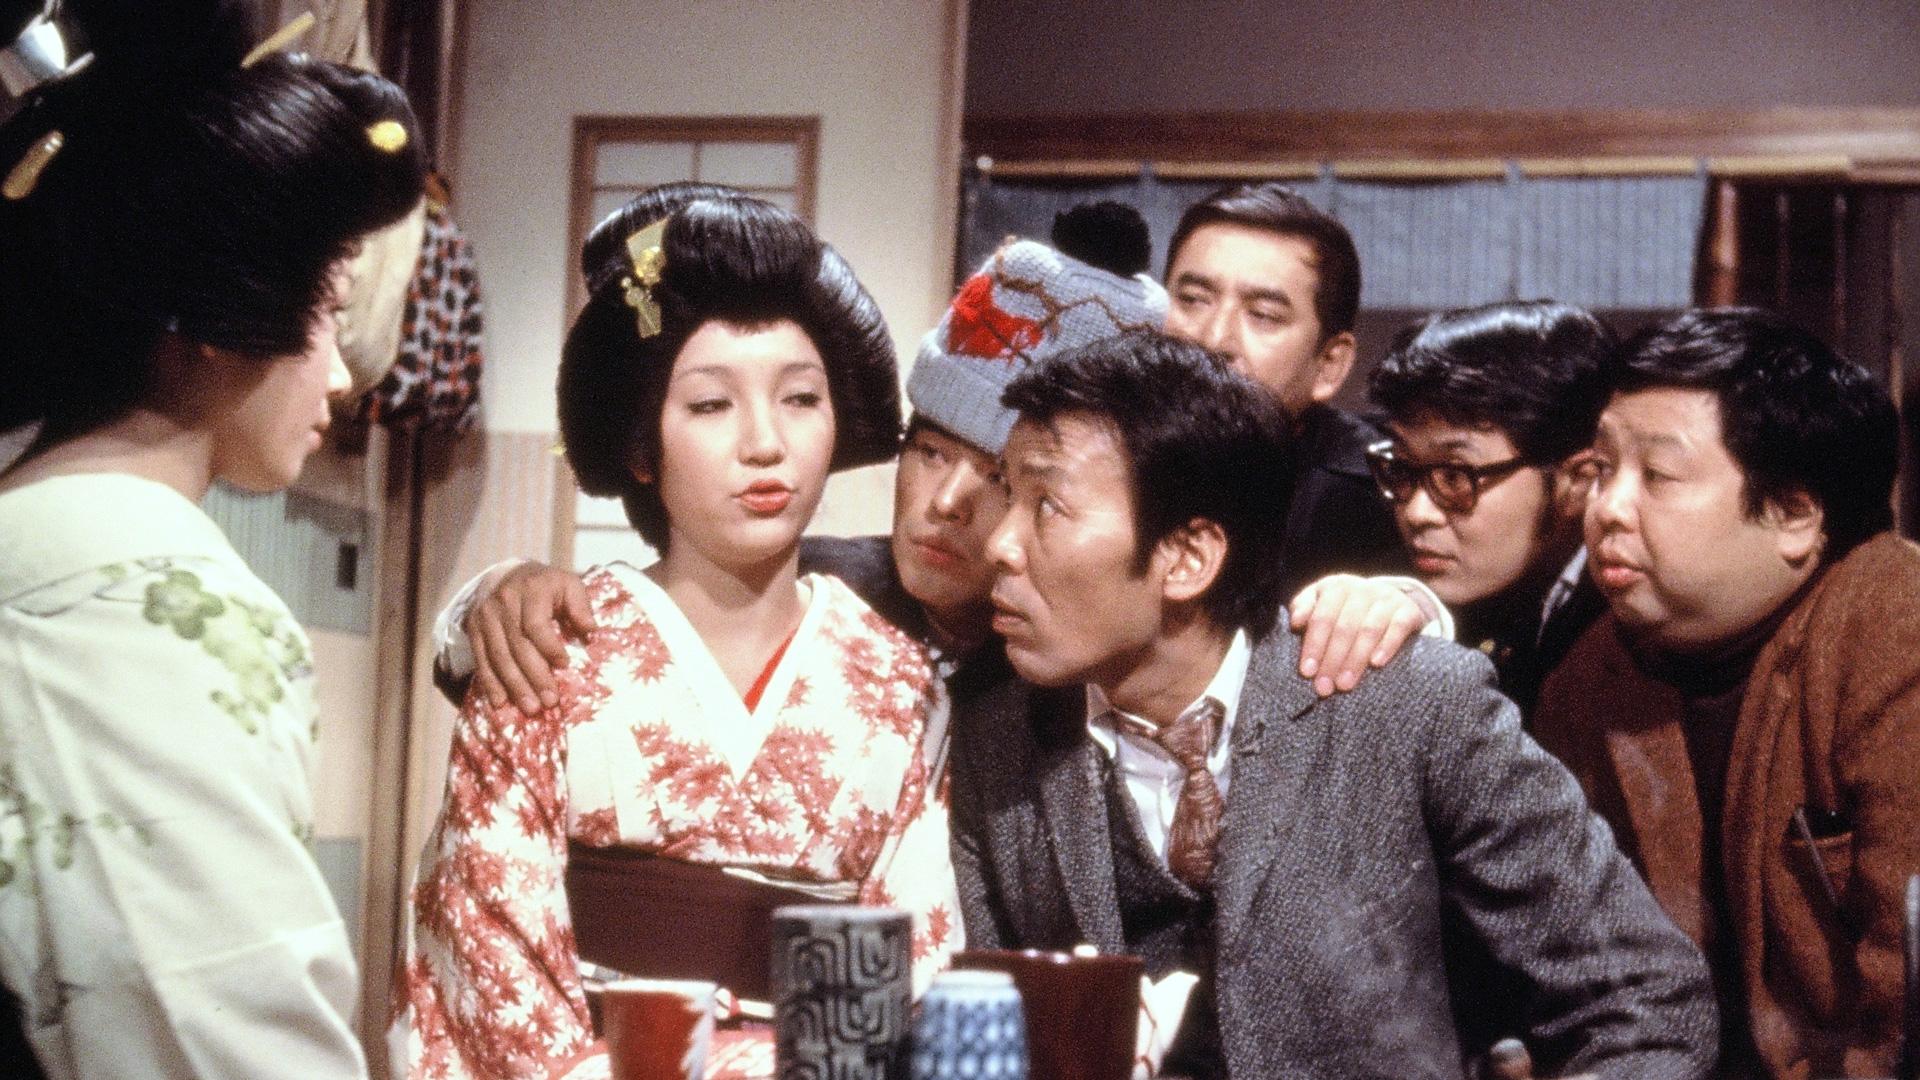 映画「大事件だよ全員集合!!」【HD初放送&未DVD化作品】